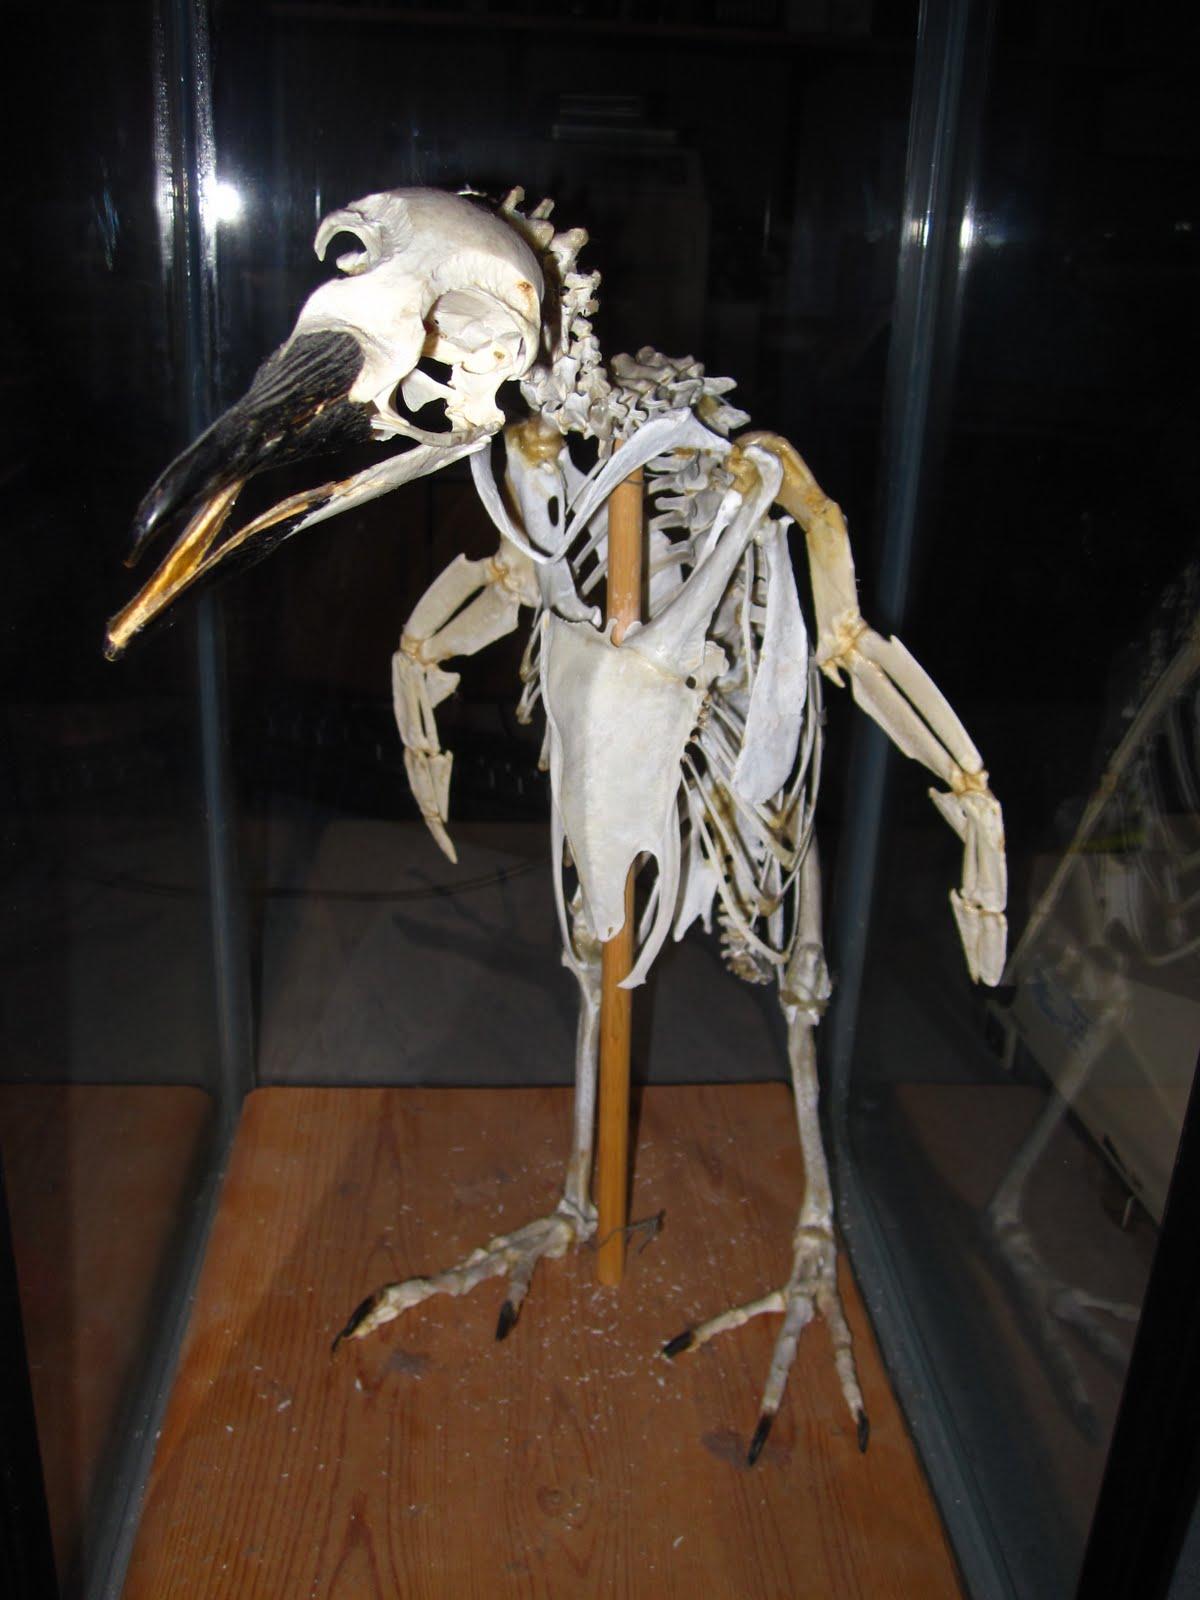 Faq do penguins have knees